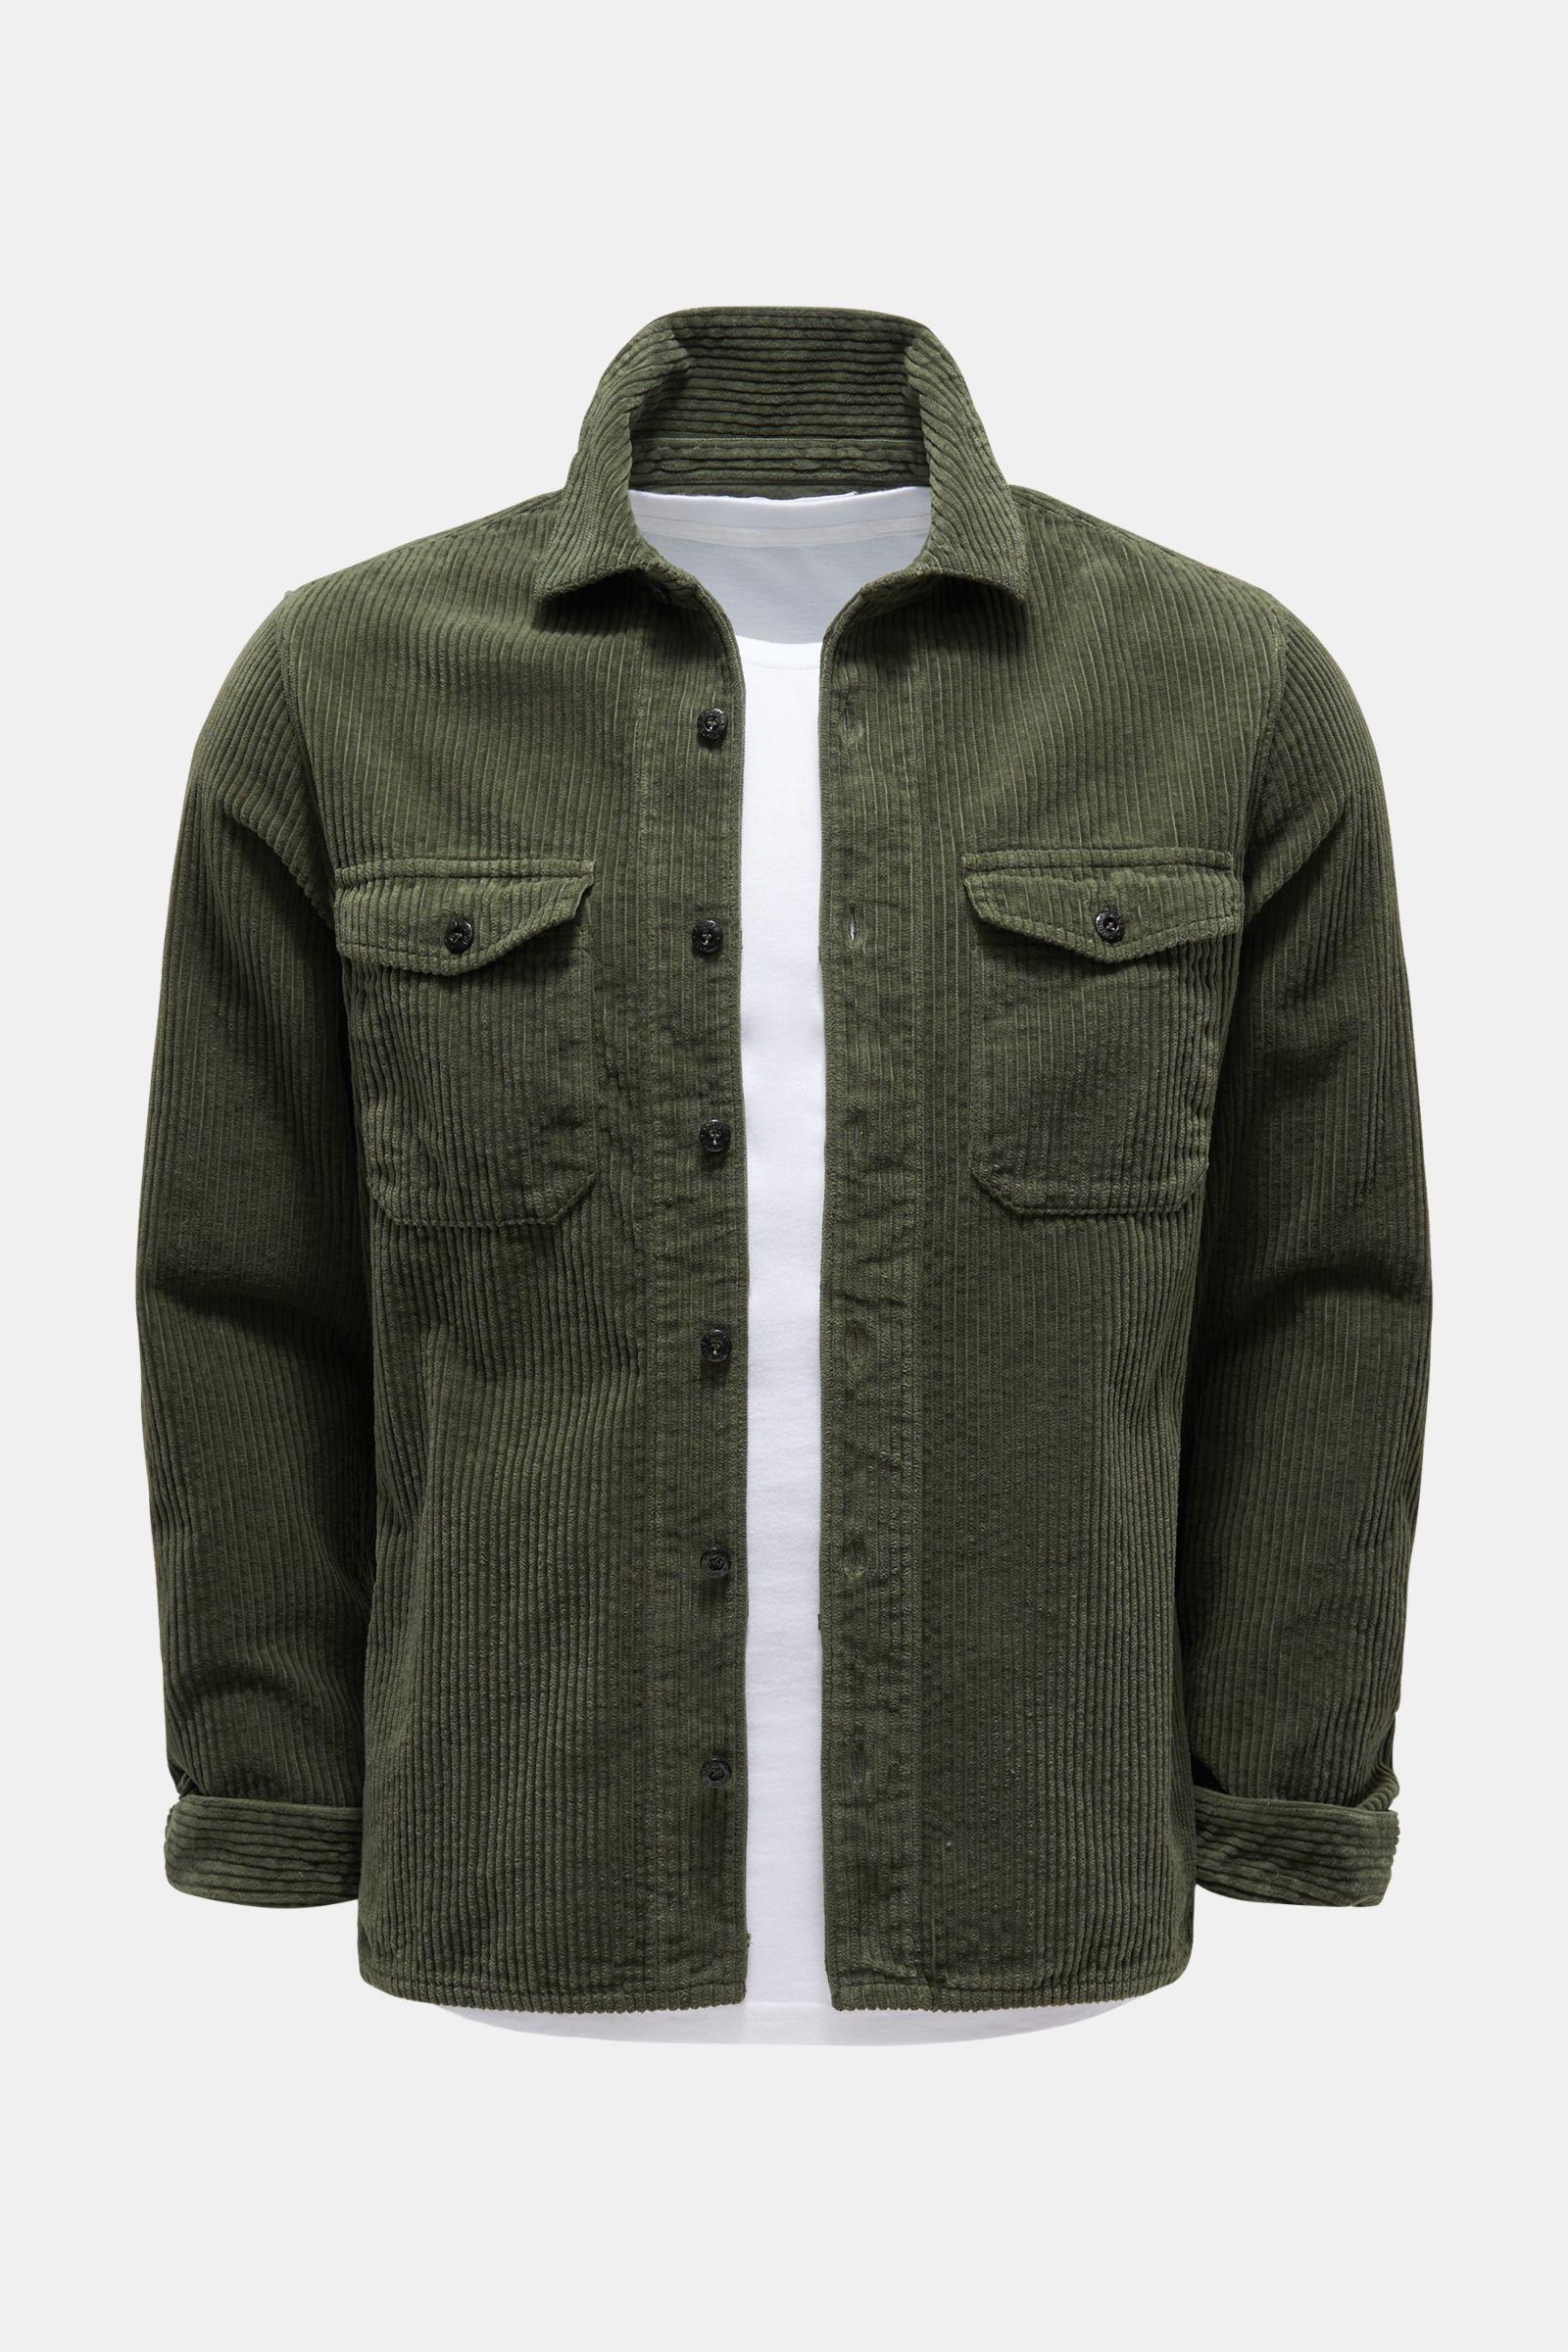 Cord-Overshirt graugrün